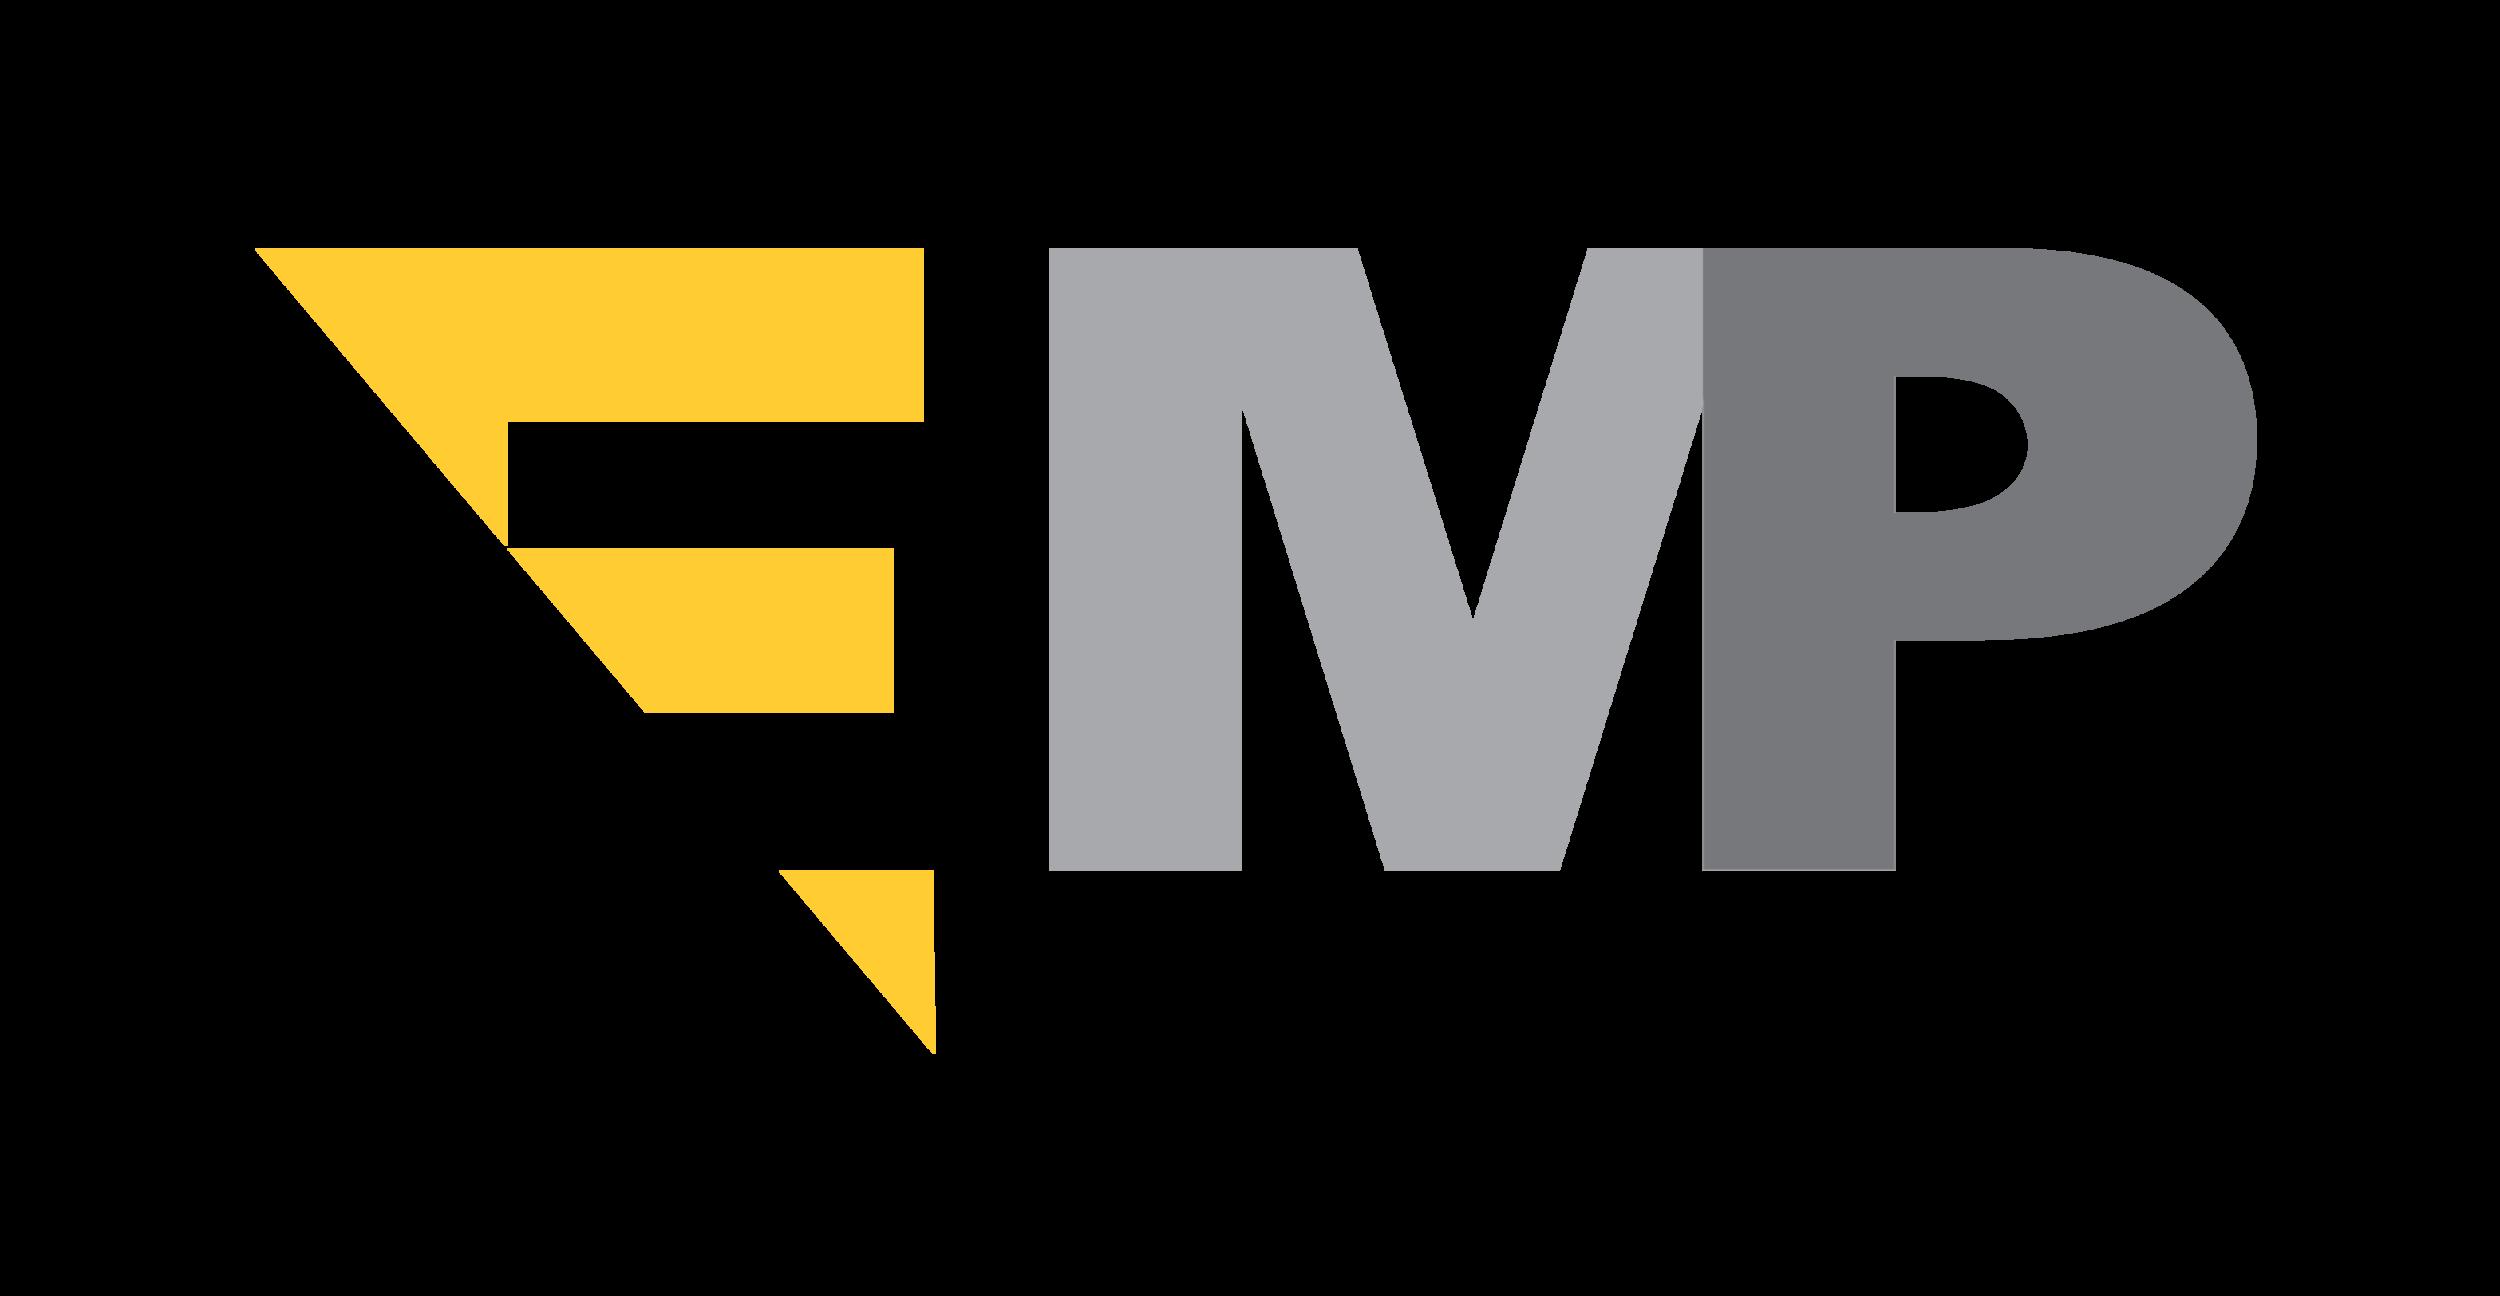 59_EMP Logo 6 FINAL-01.png